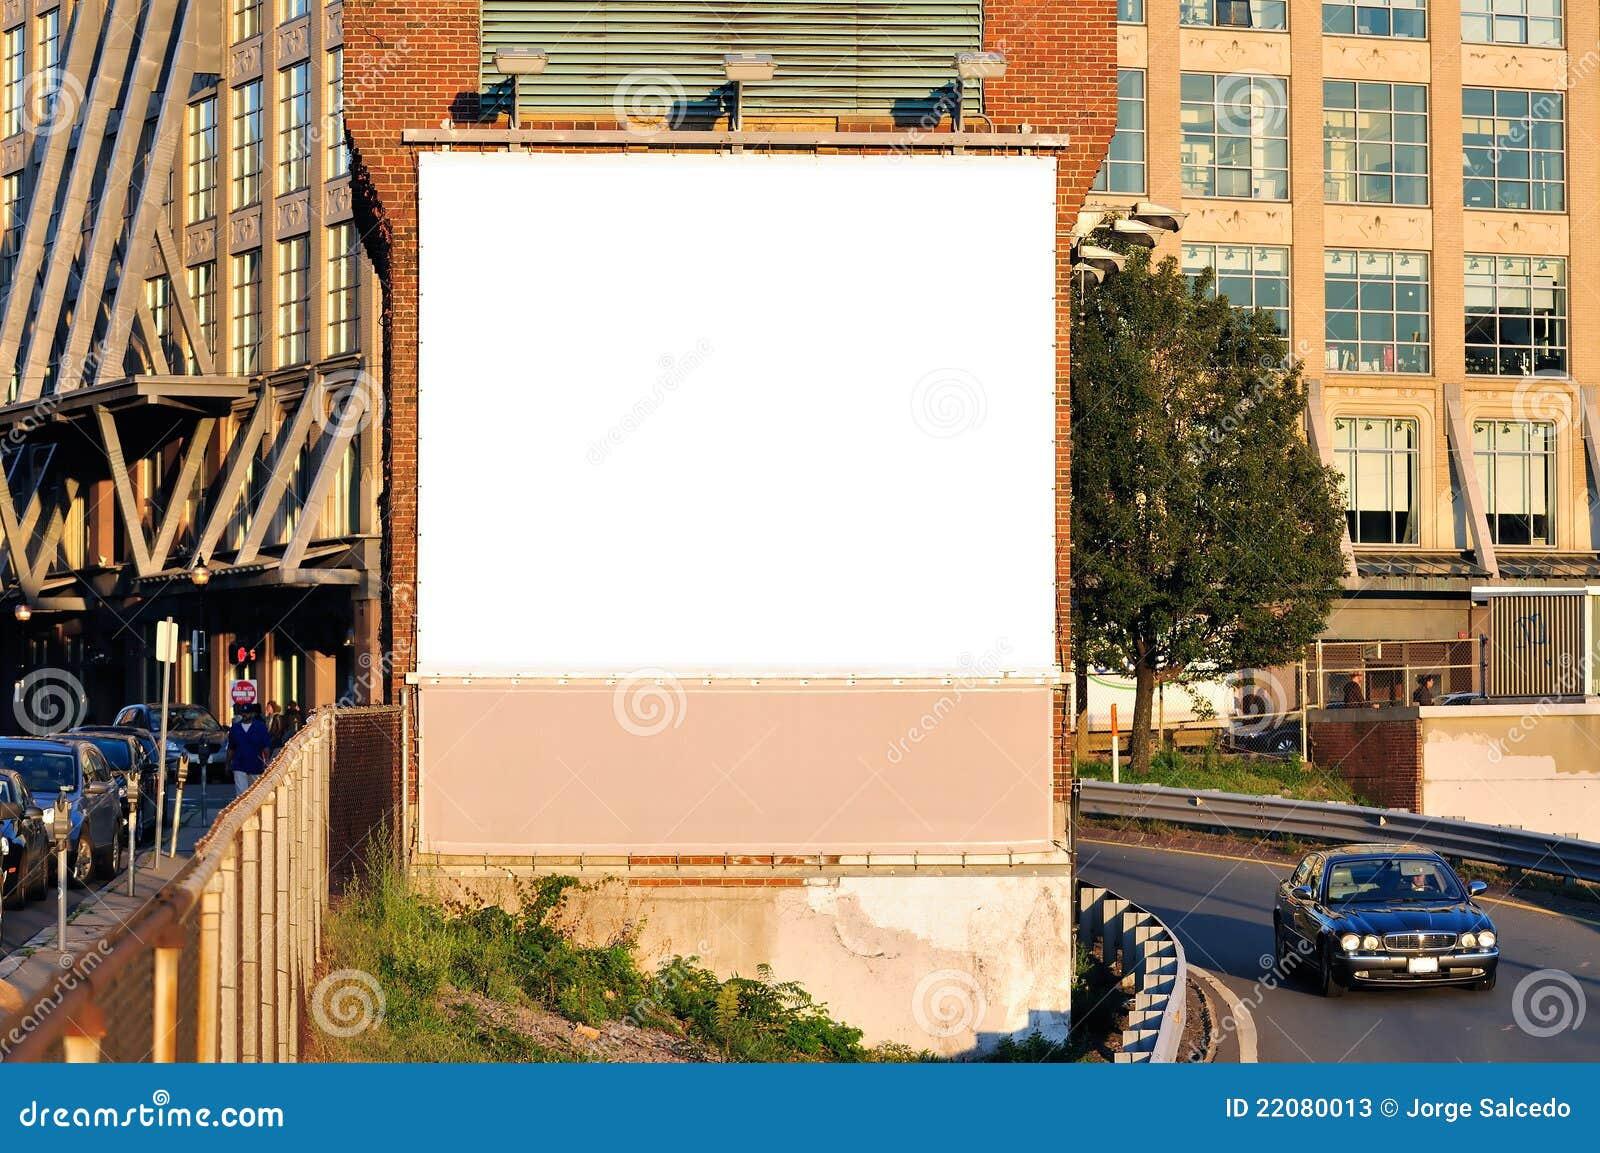 Square Billboard Stock Photos - Image: 22080013